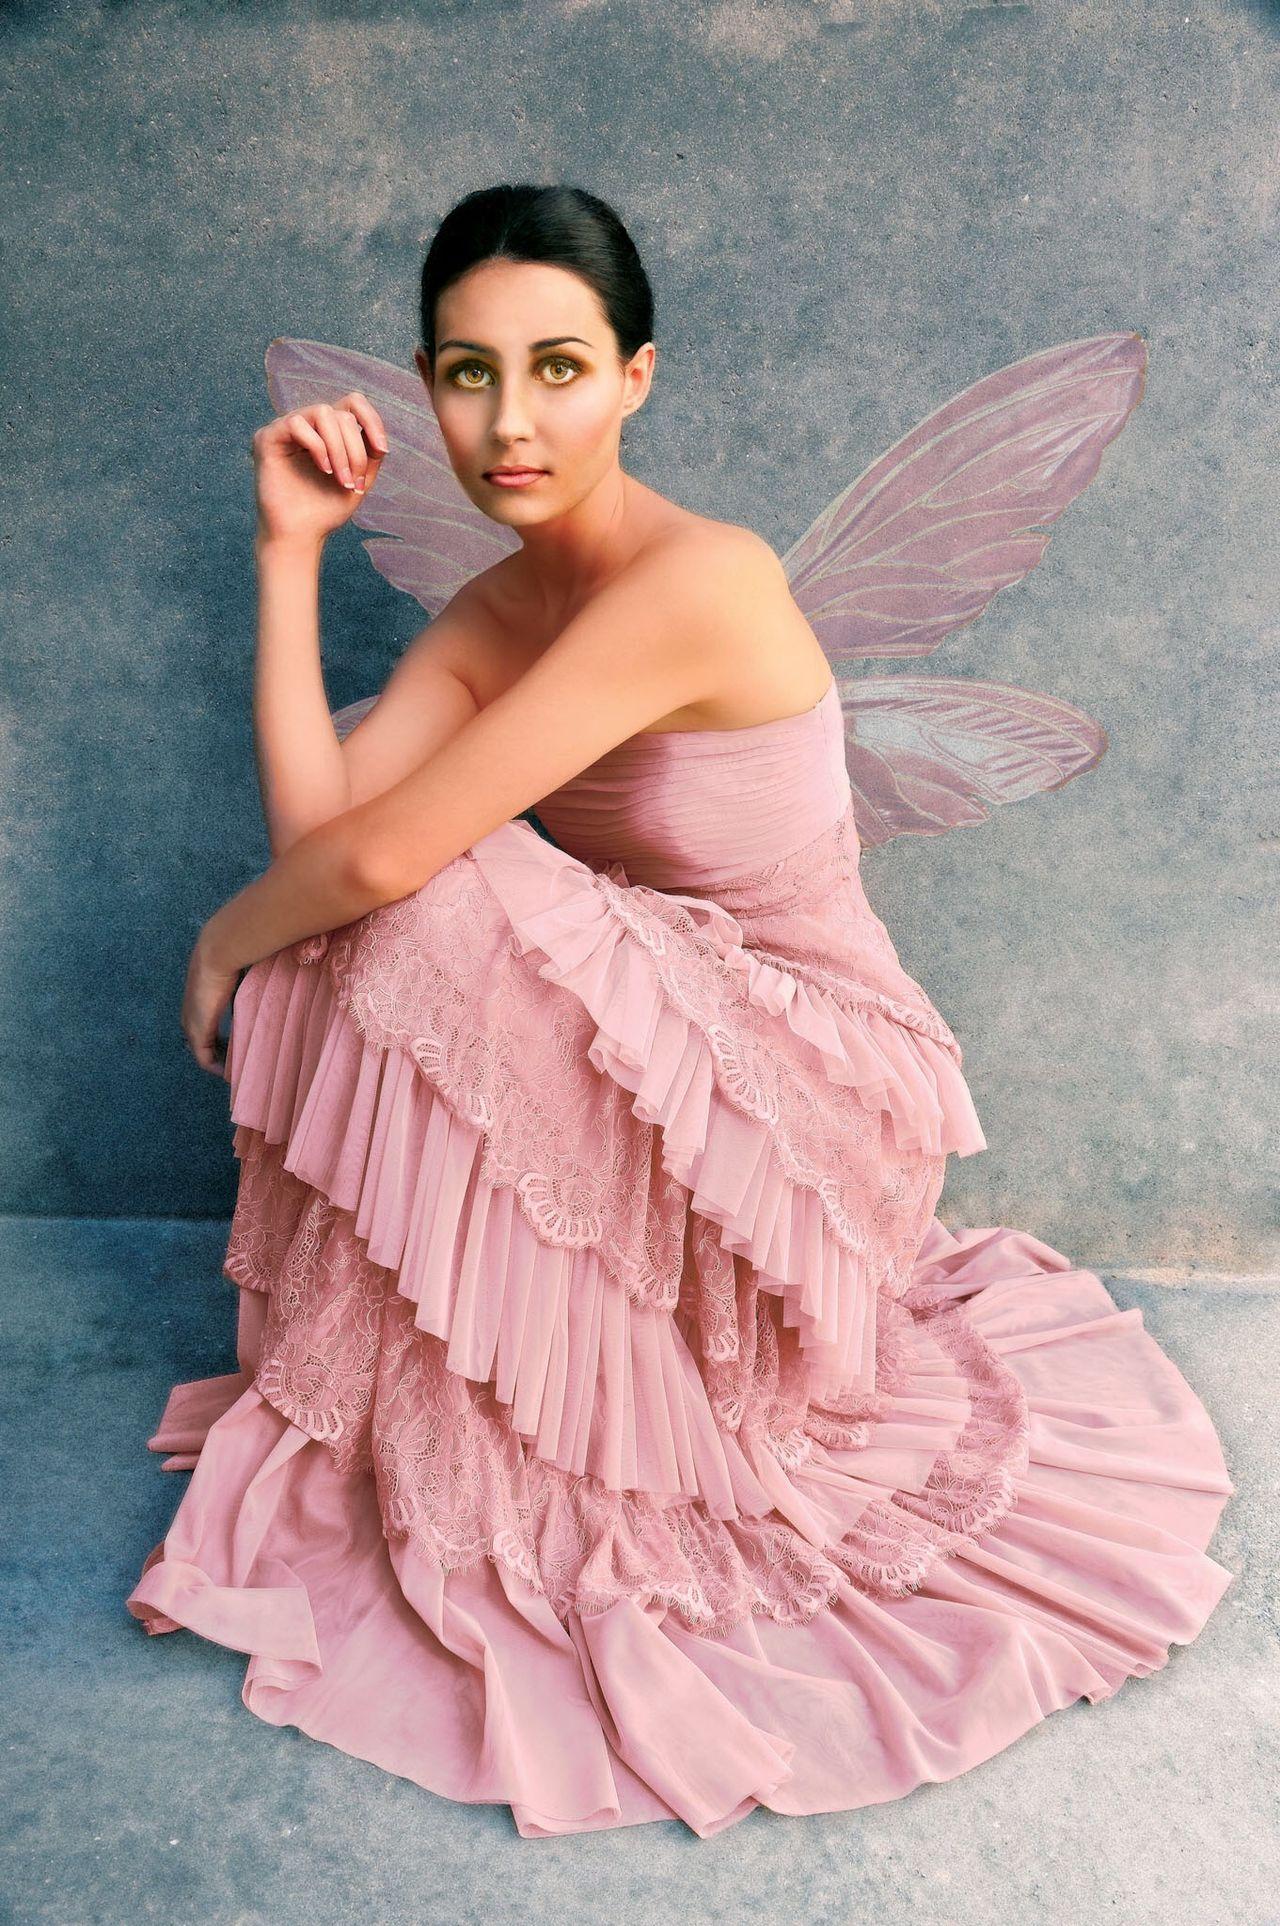 Beautiful stock photos of fairy, 20-24 Years, Beautiful People, Beautiful Woman, Caucasian Ethnicity